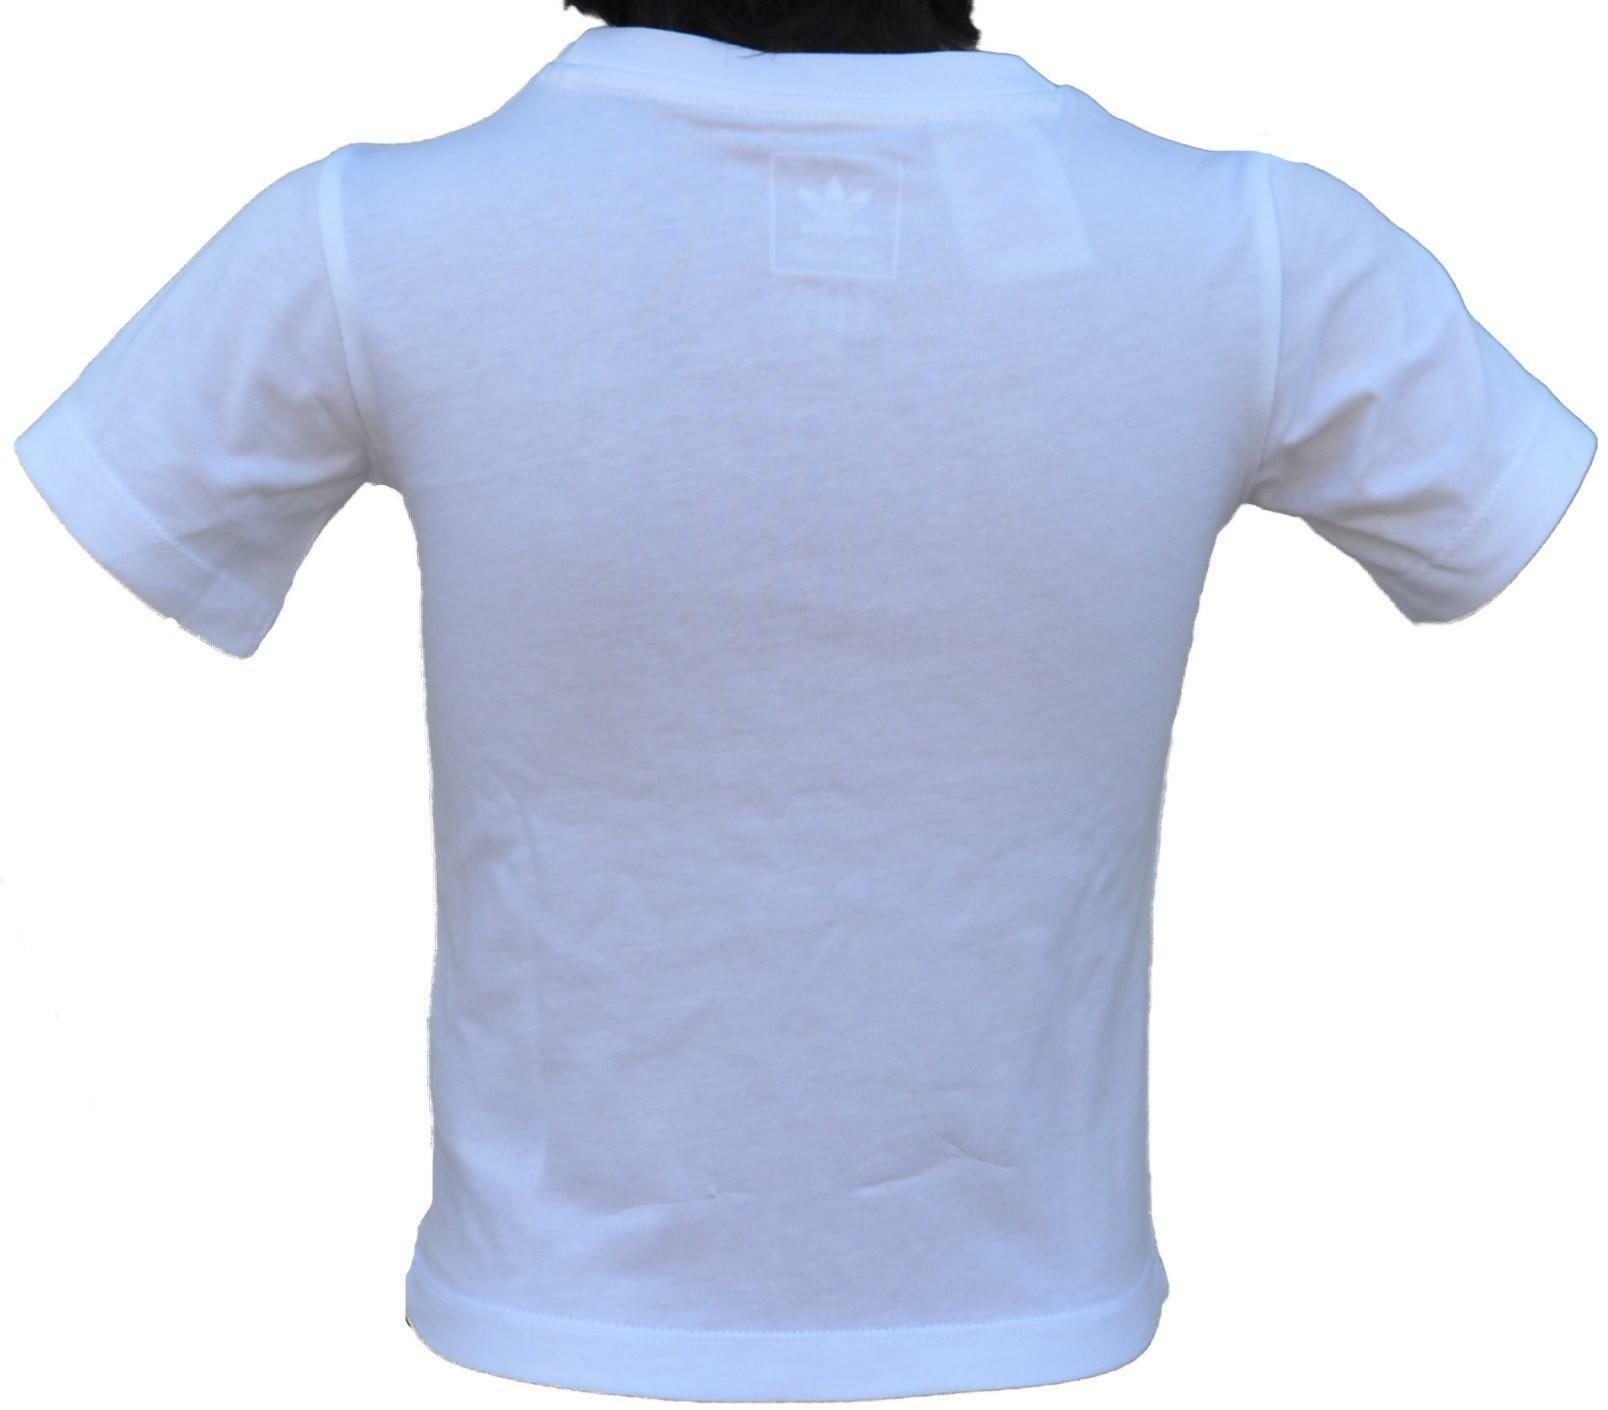 adidas adidas i trf tee t-shirt bambina bianca d96102